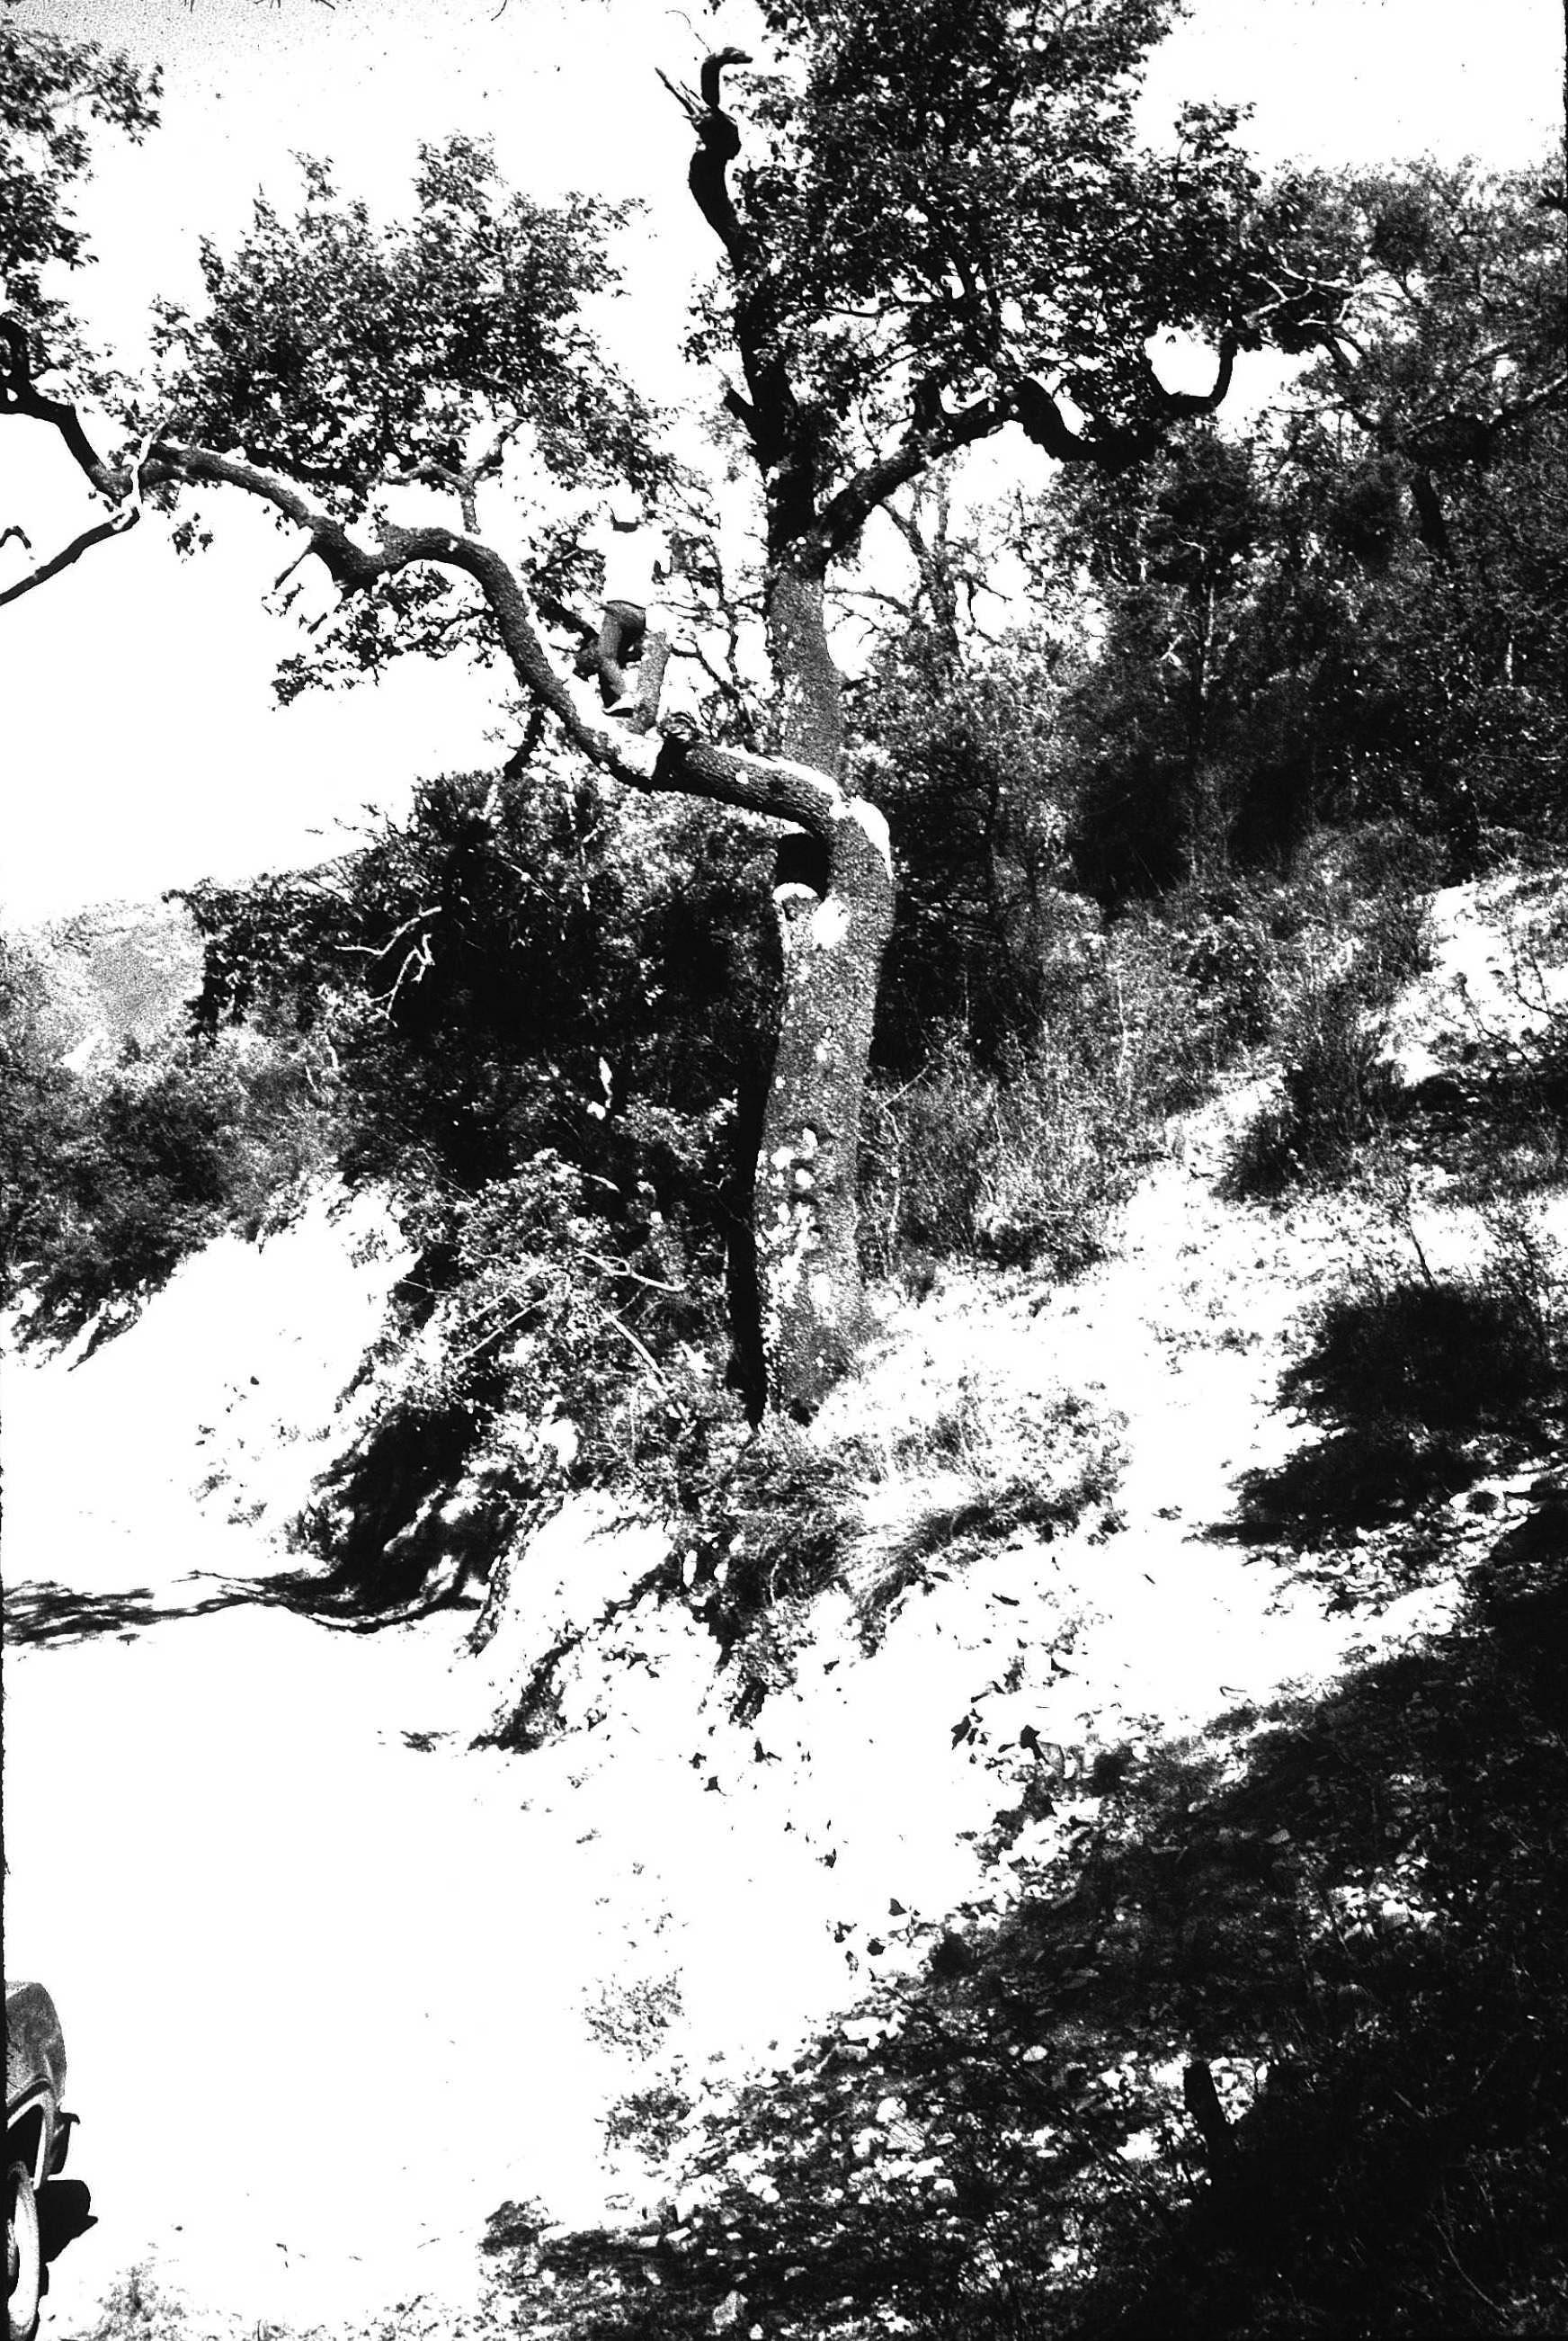 Prunus serótina Ehrh. ssp. capuli (Cav. ex Spreng.) McVaugh. Se agrade- ce la asistencia del Dr. A. Eduardo Estrada Castillón.